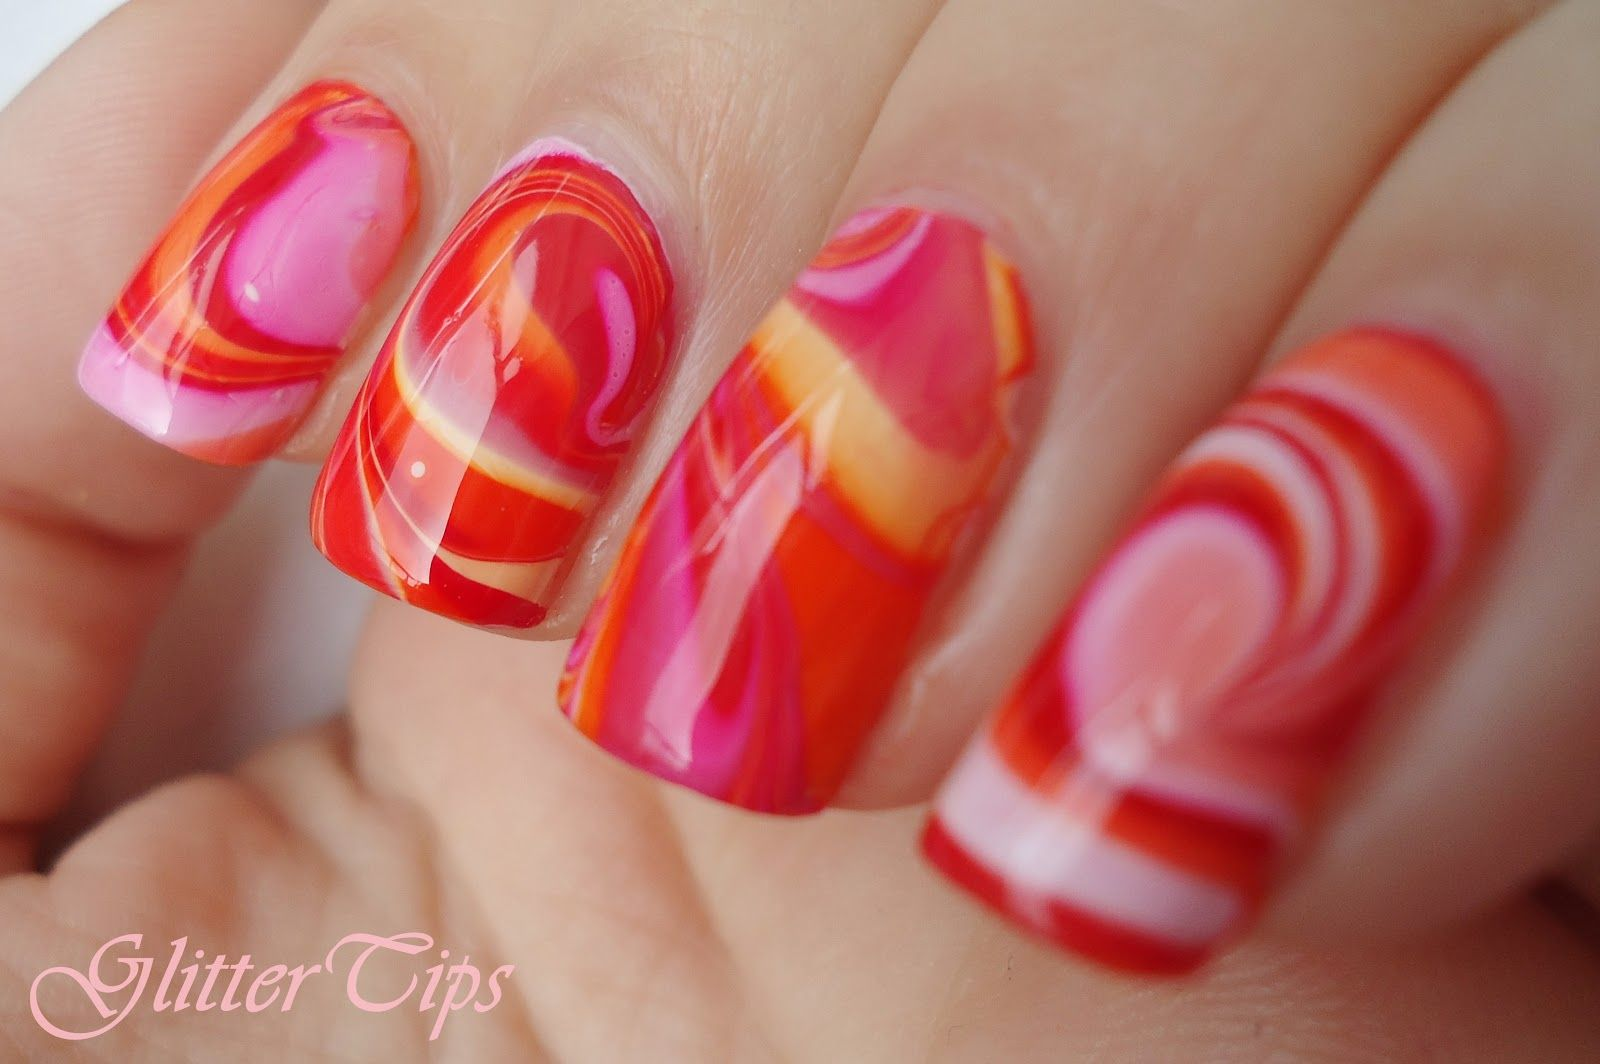 Glitter Tips: Rio Beauty - Marble Nail Art Polish: London ...